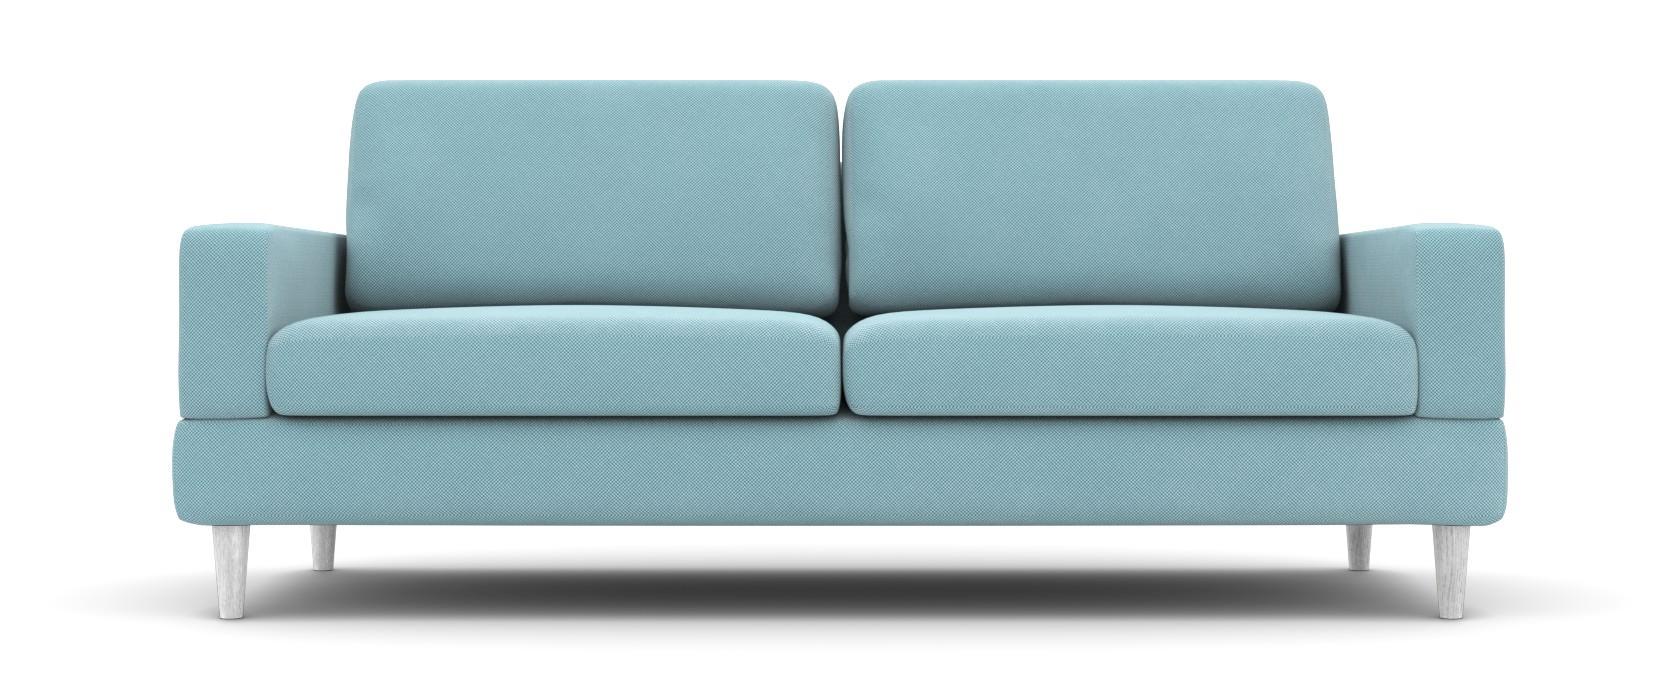 Трехместный диван Bruno - Pufetto